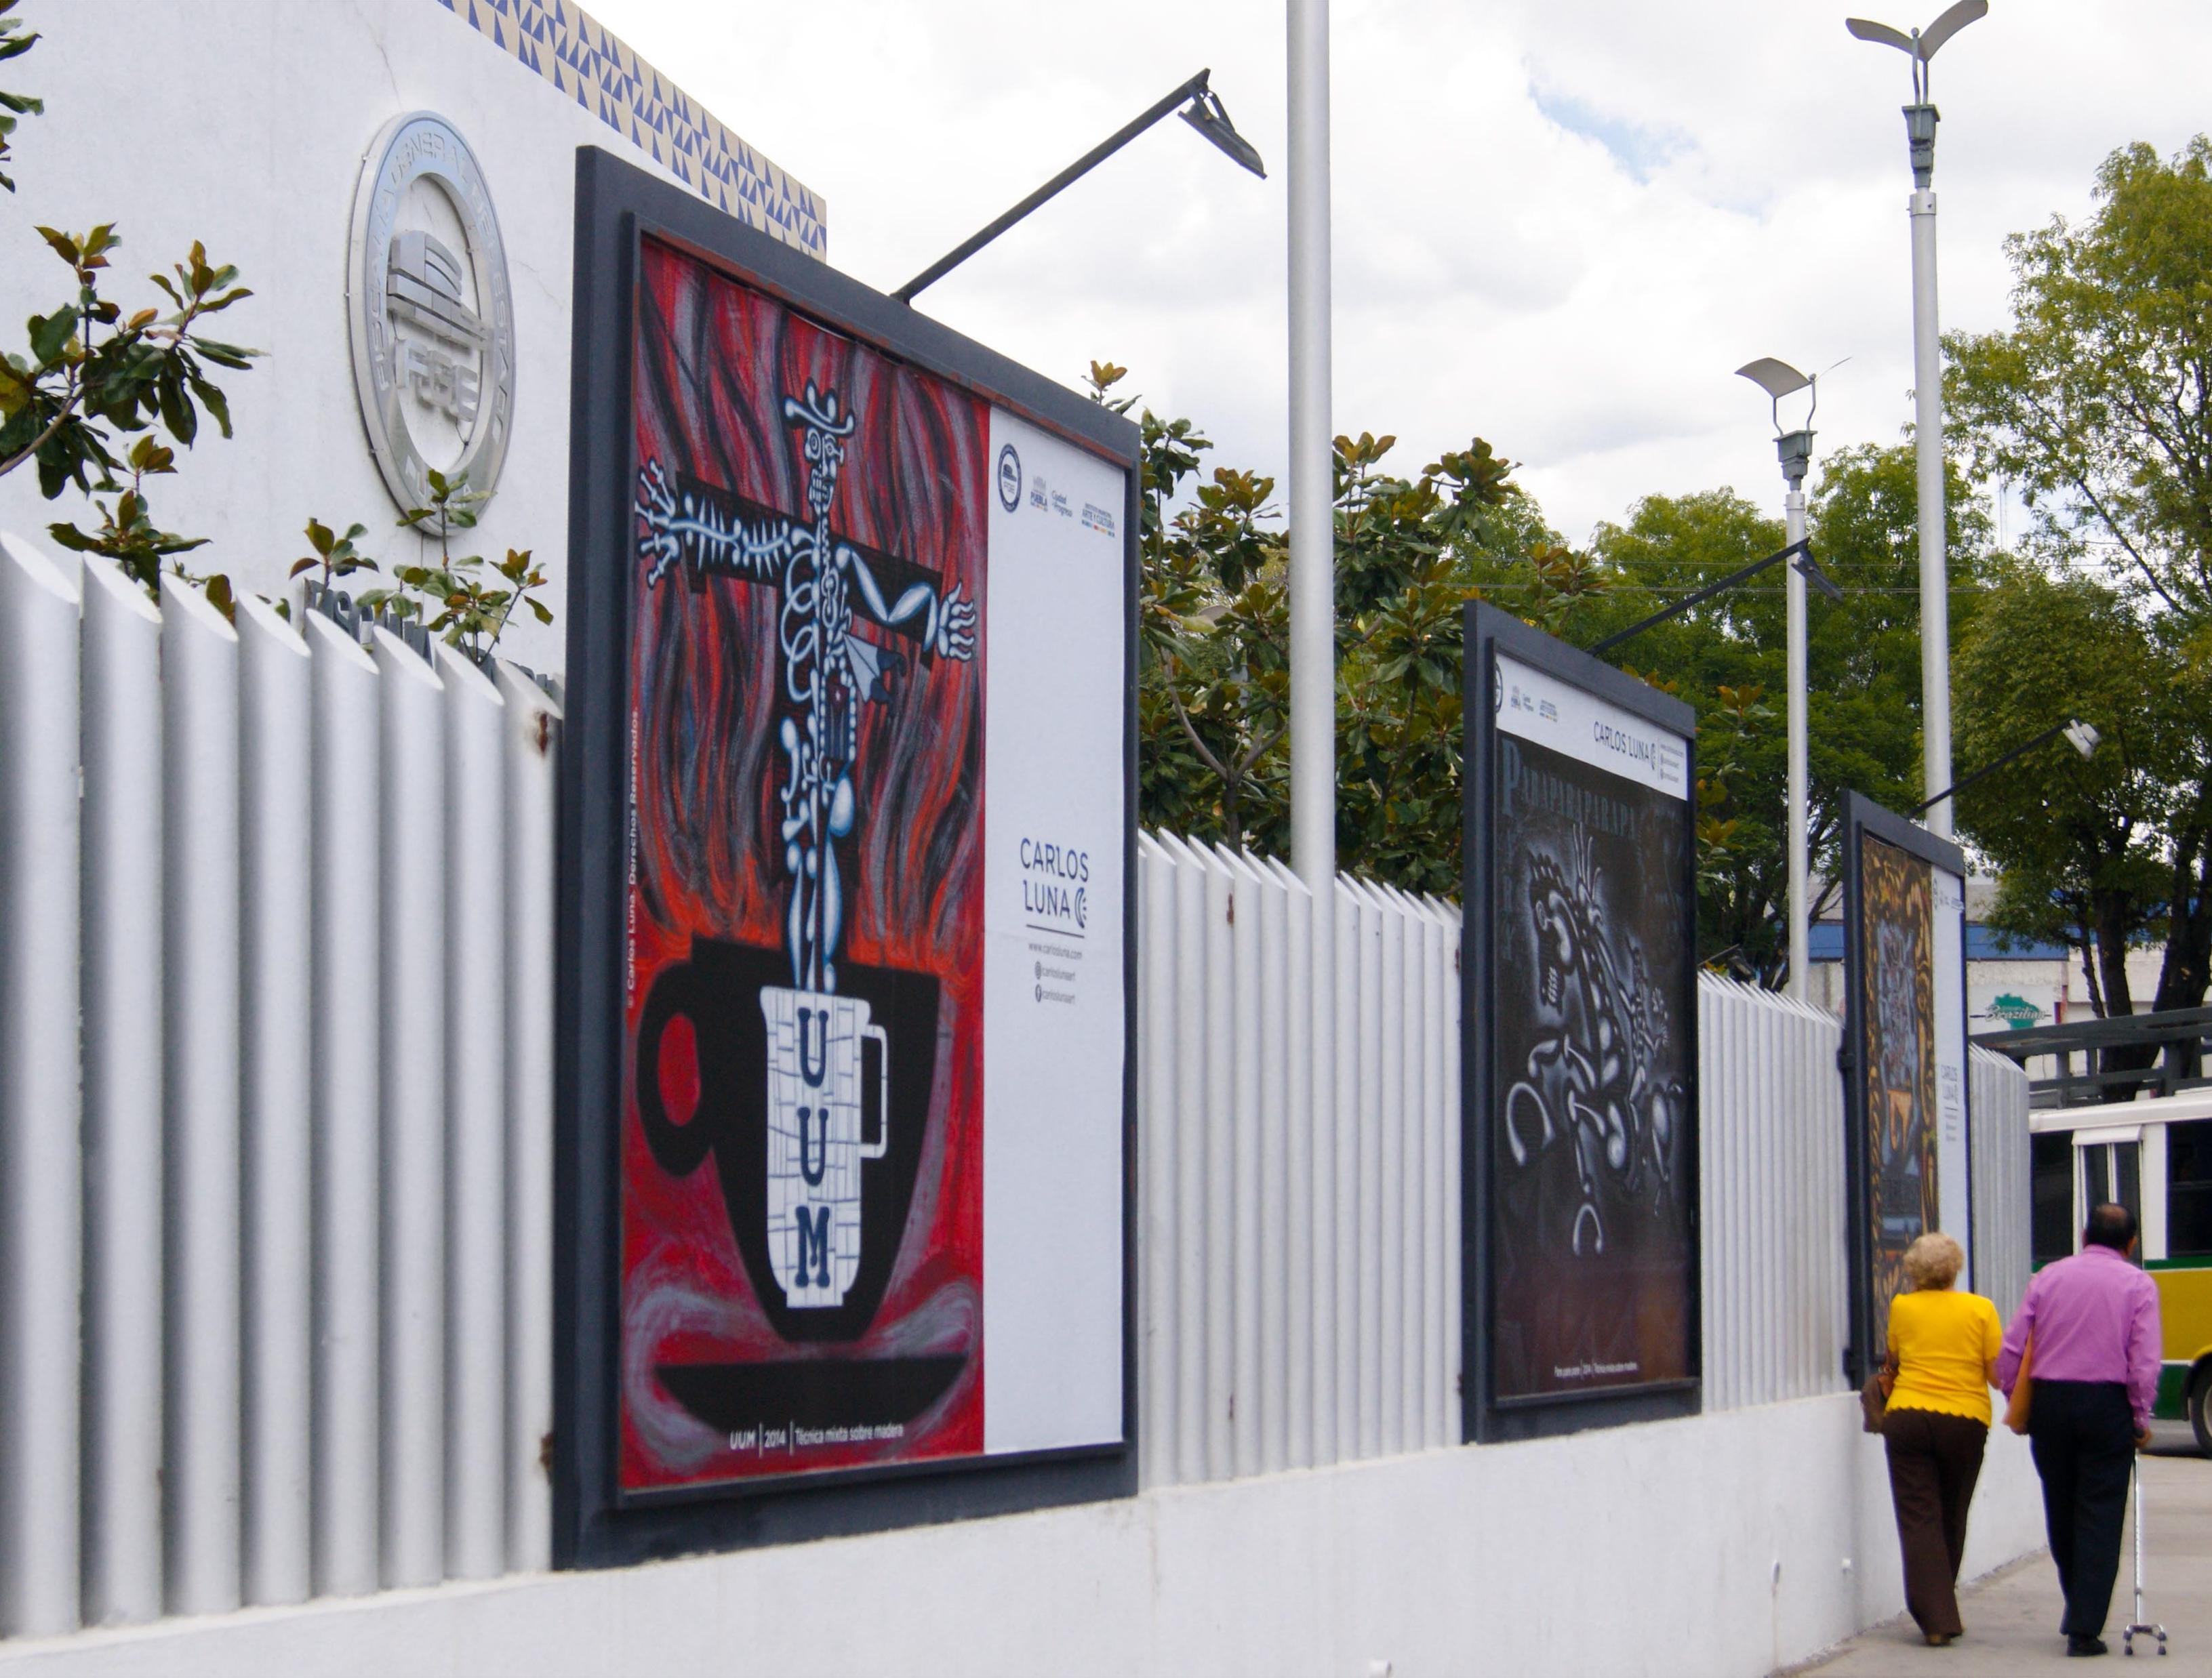 Public Art Project; Zócalo, Fiscalía, Panteón, Puebla, Mexico, 2018